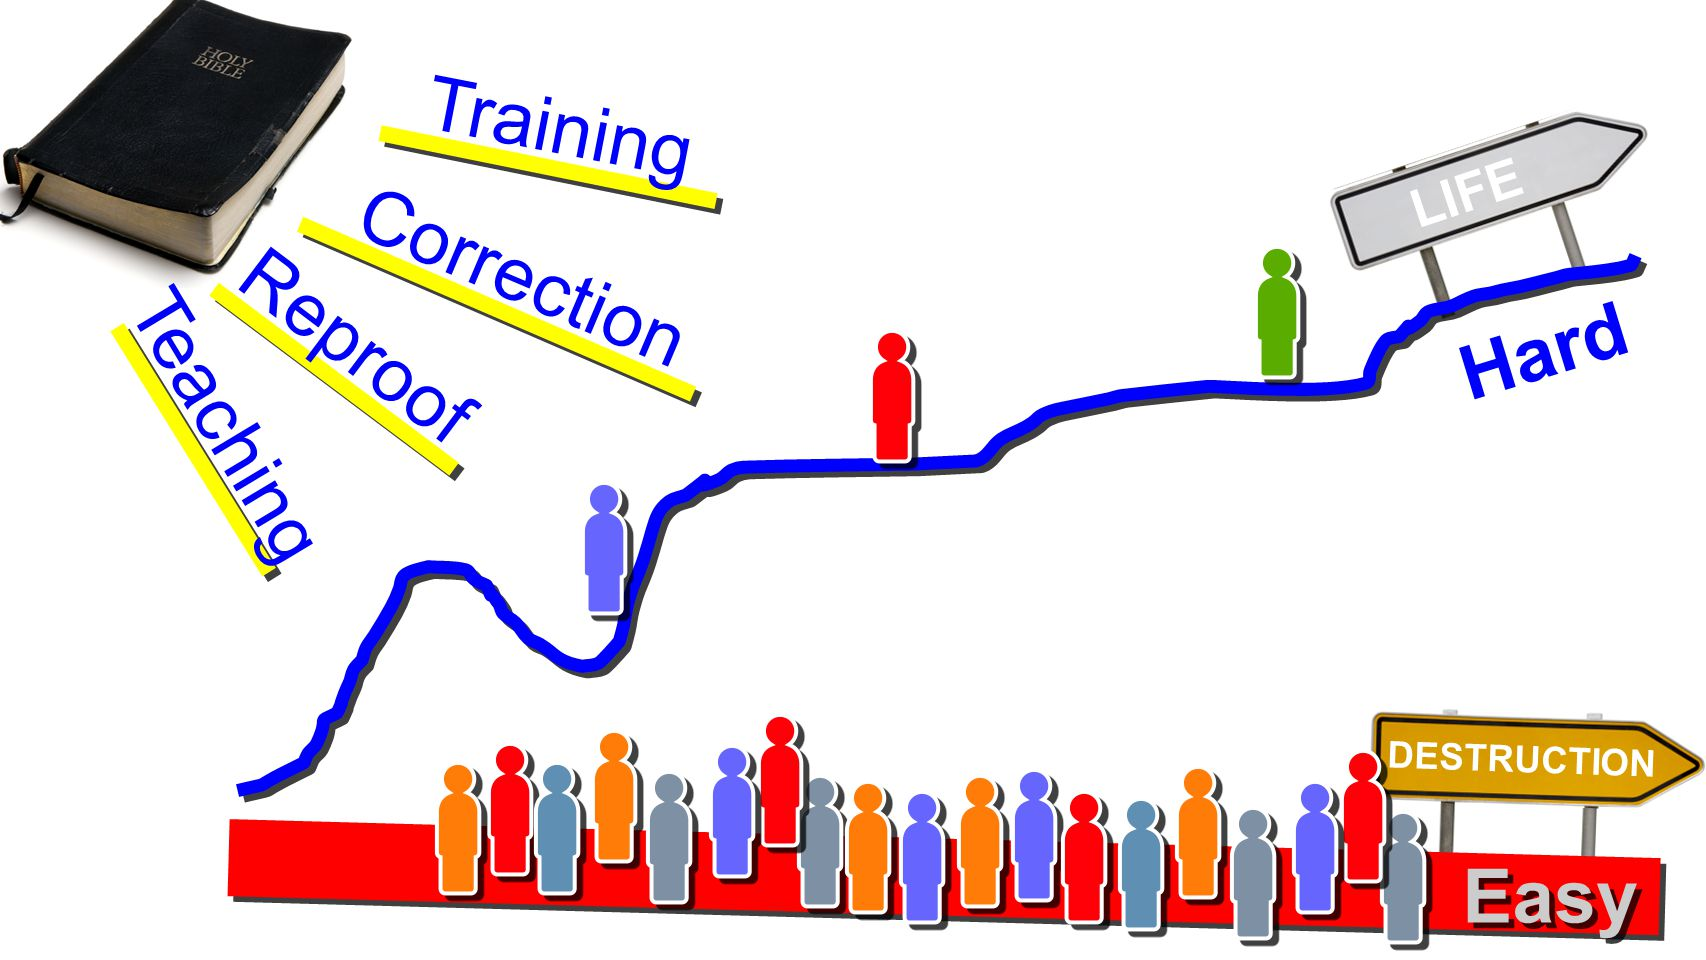 DESTRUCTION LIFE Hard Easy Teaching Reproof Correction Training